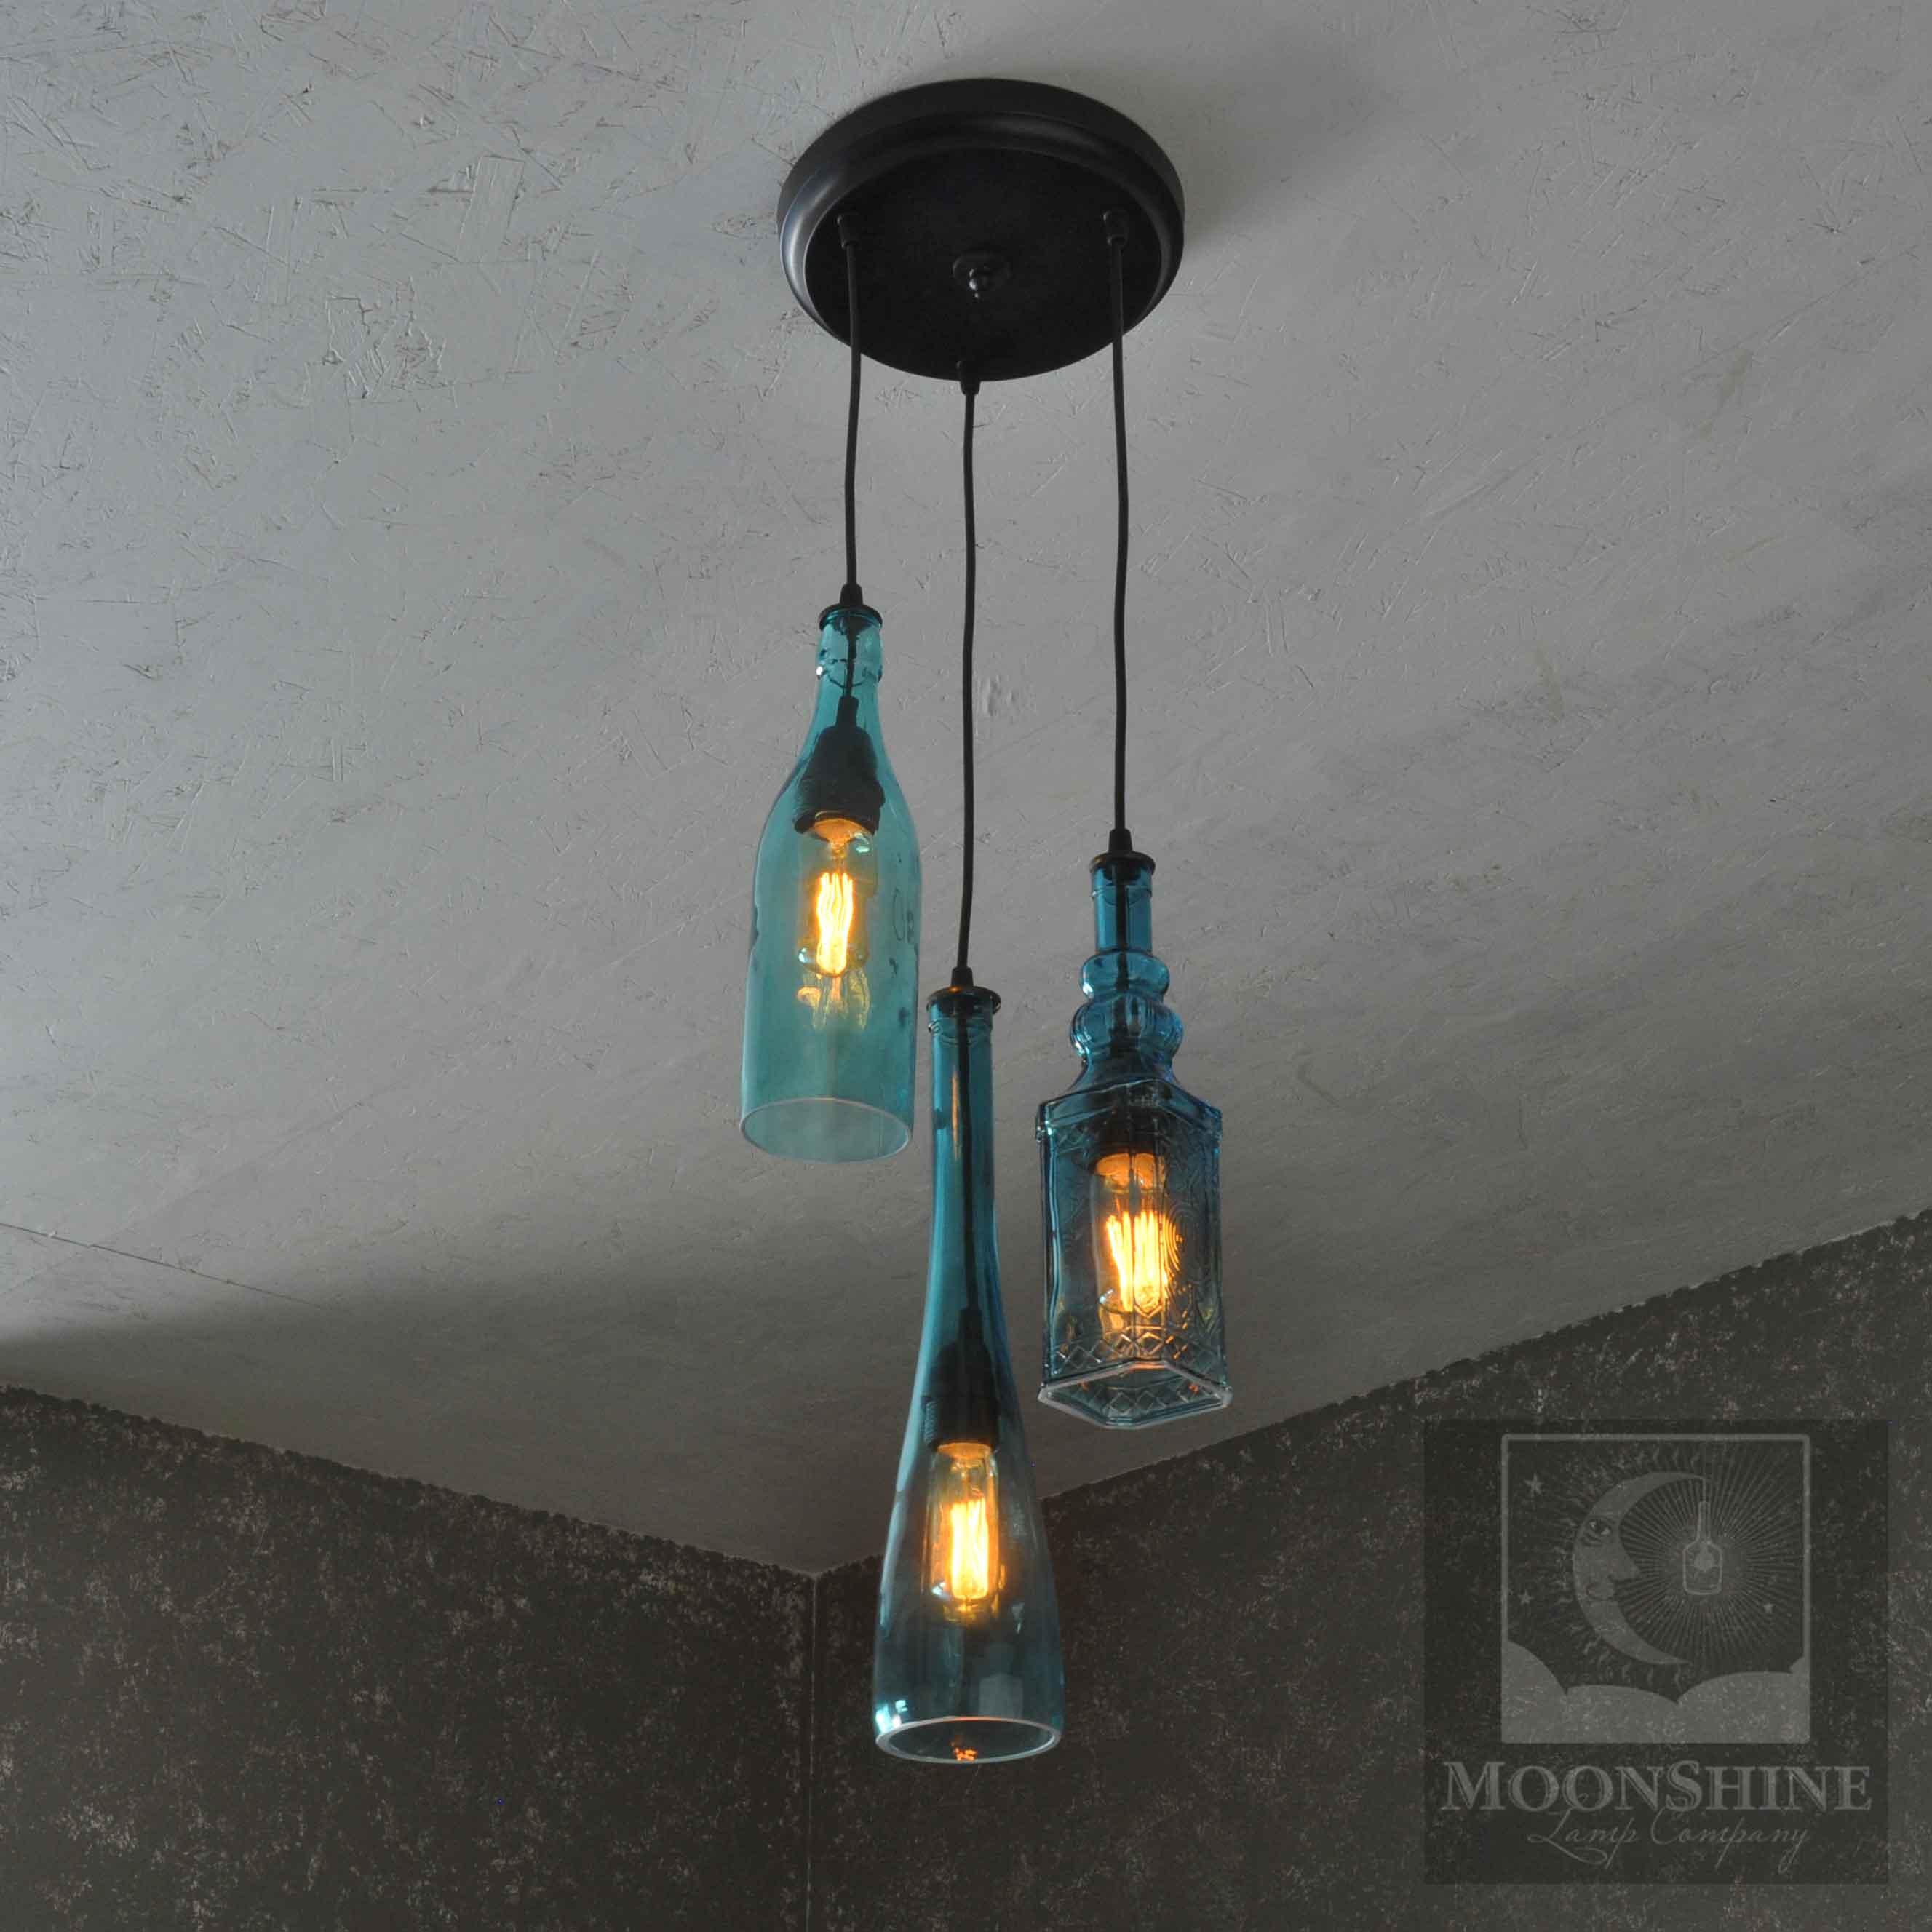 The Harmony 3 Light Chandelier Moonshine Lamp pany